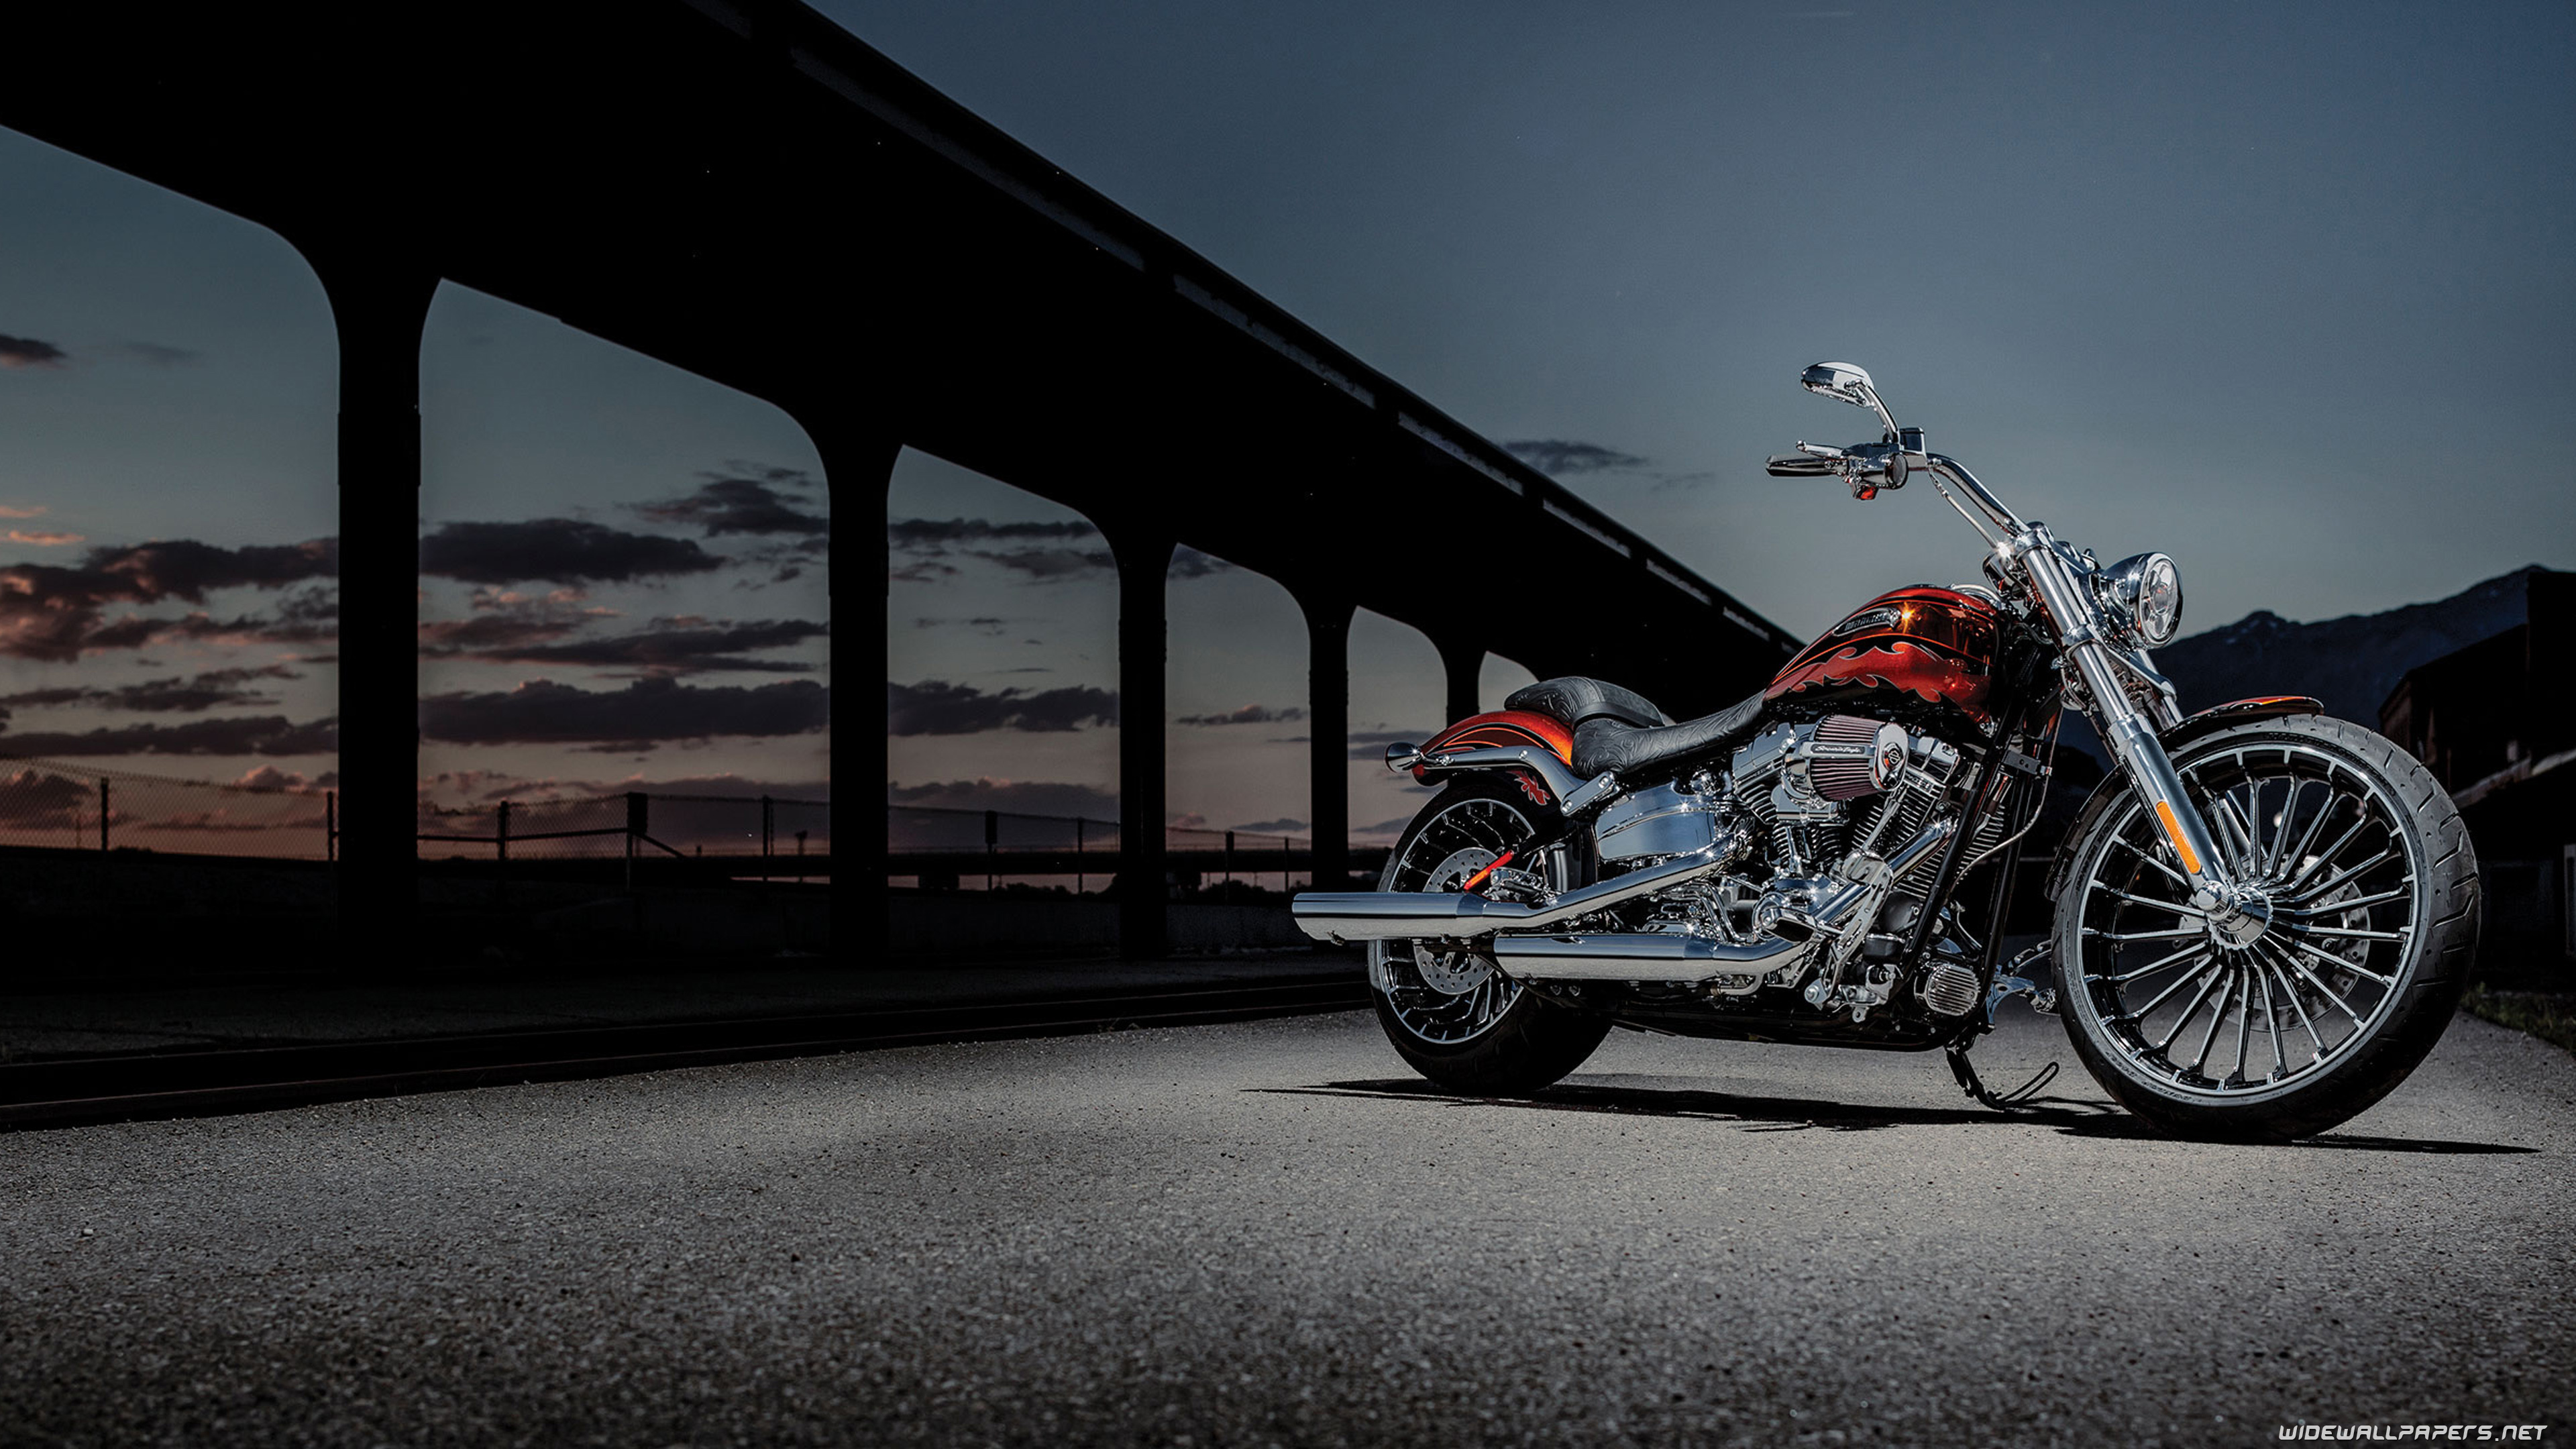 Harley Davidson CVO motorcycle desktop wallpapers 4K Ultra HD 3840x2160